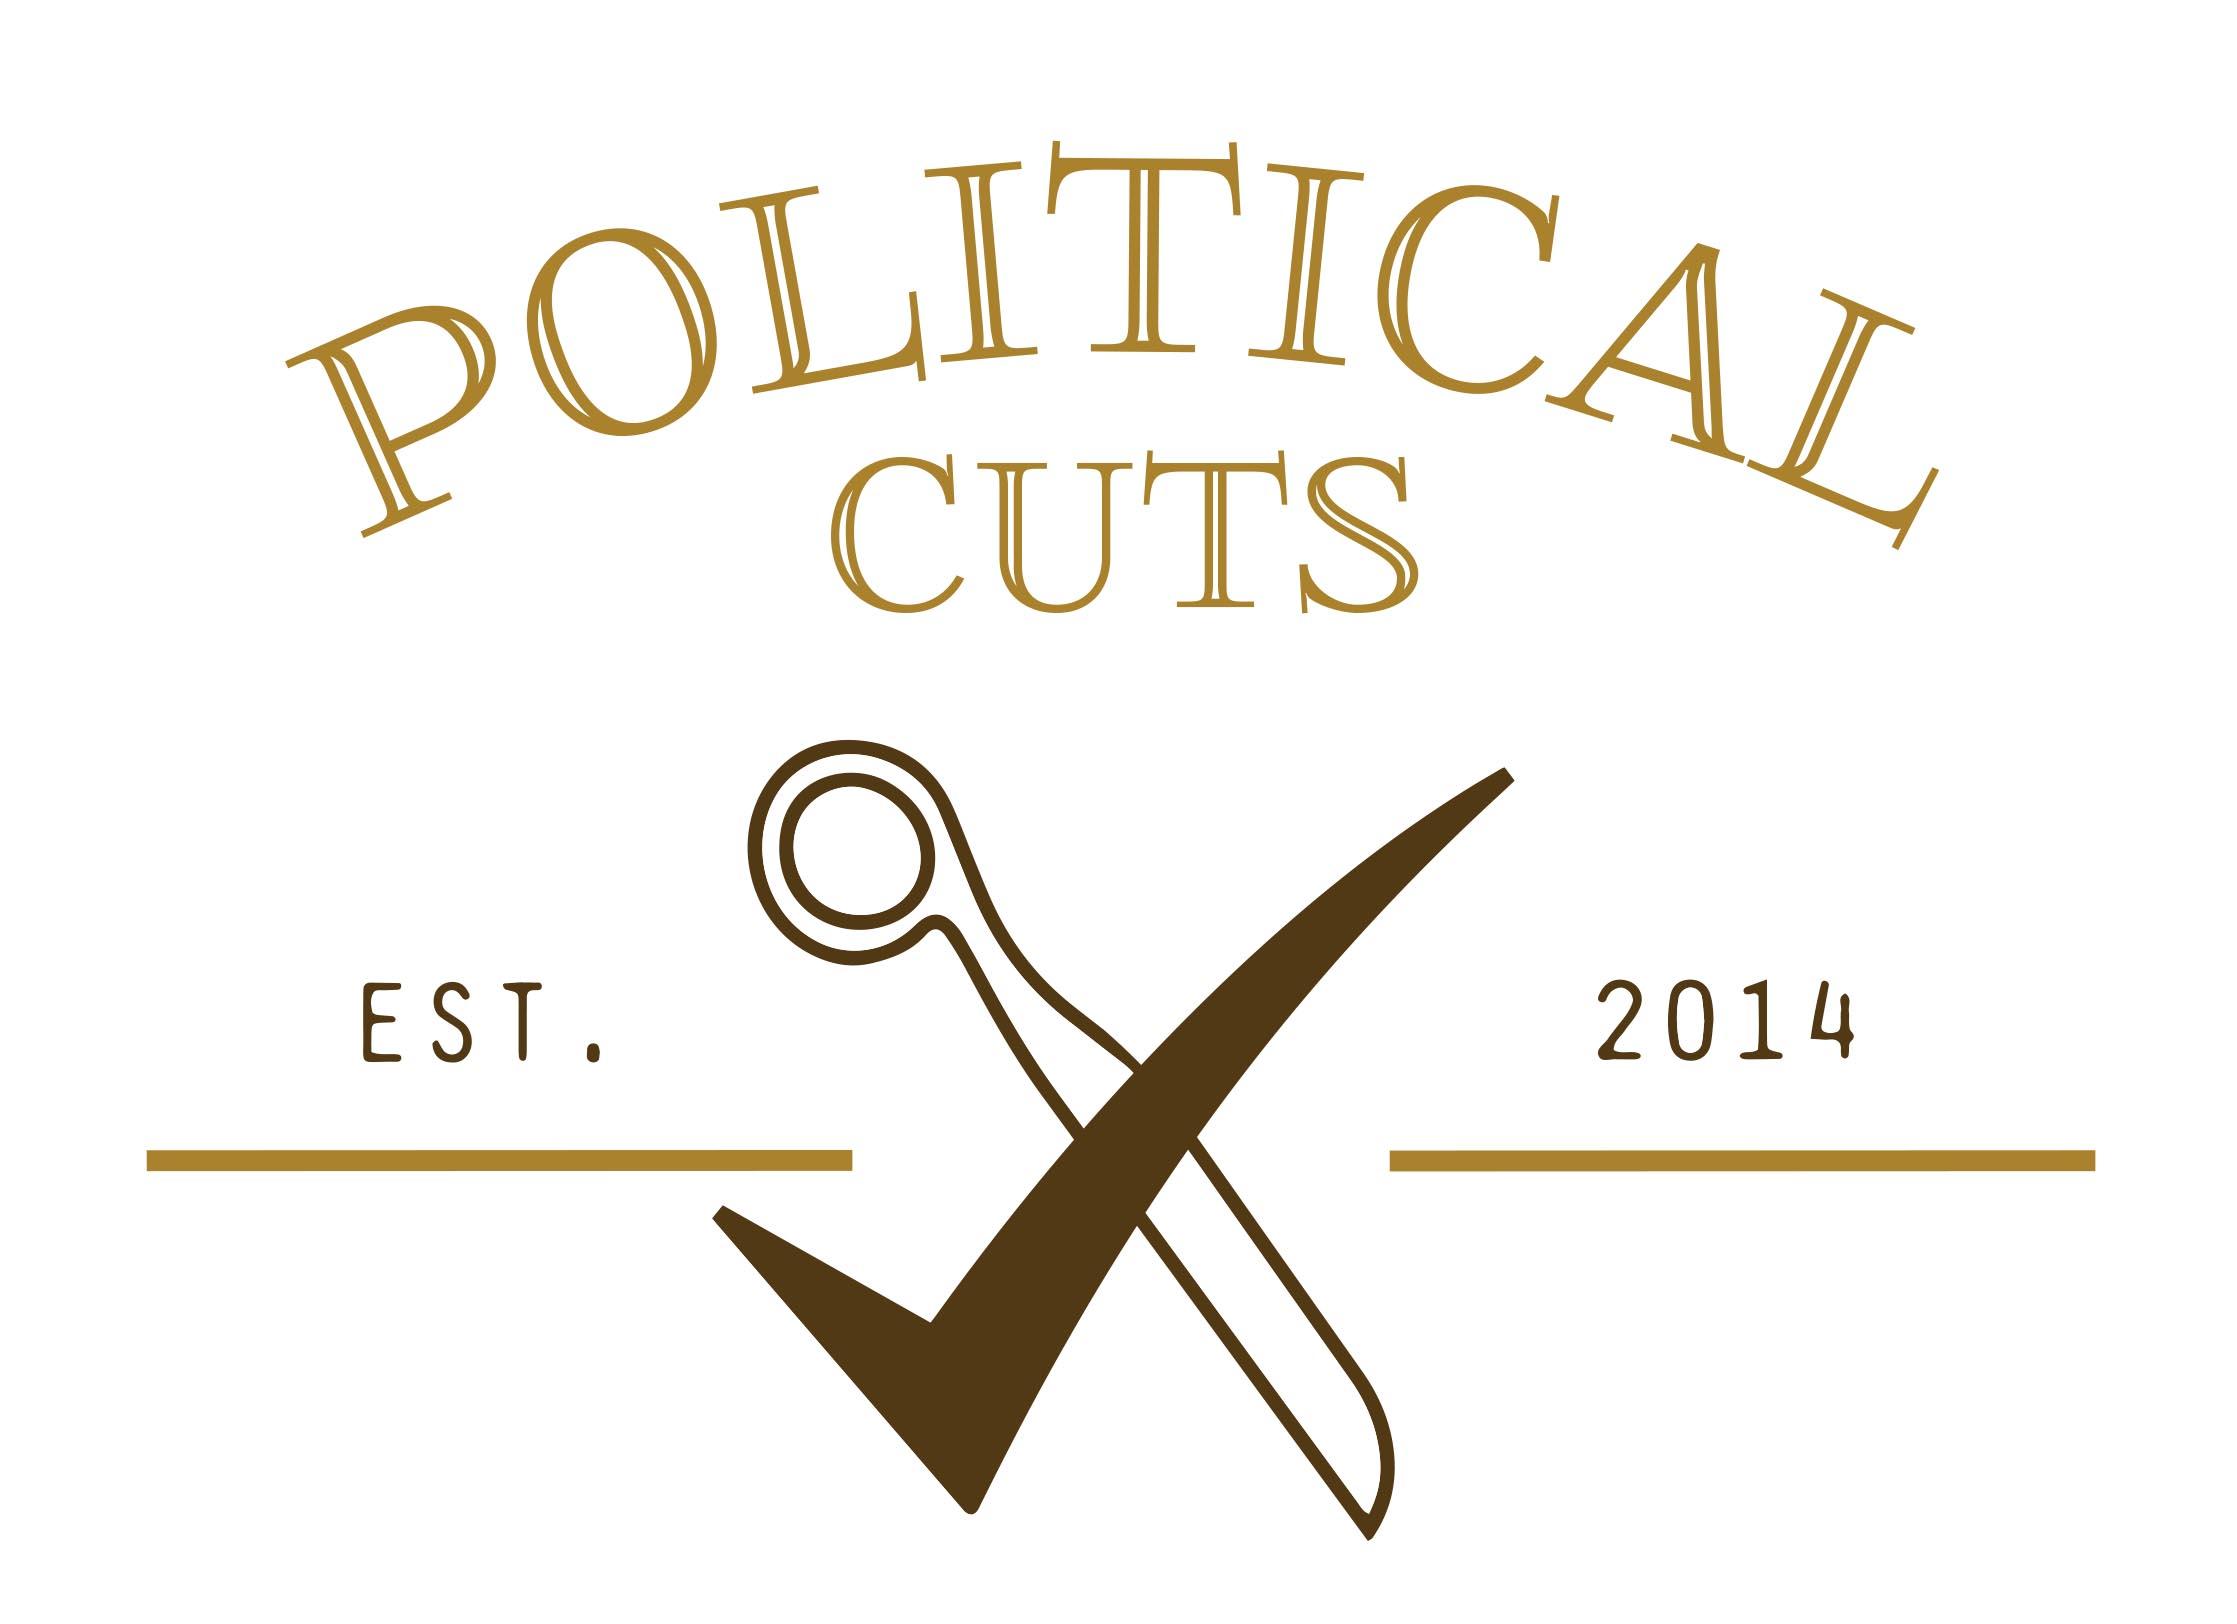 Visit the Political Cuts website